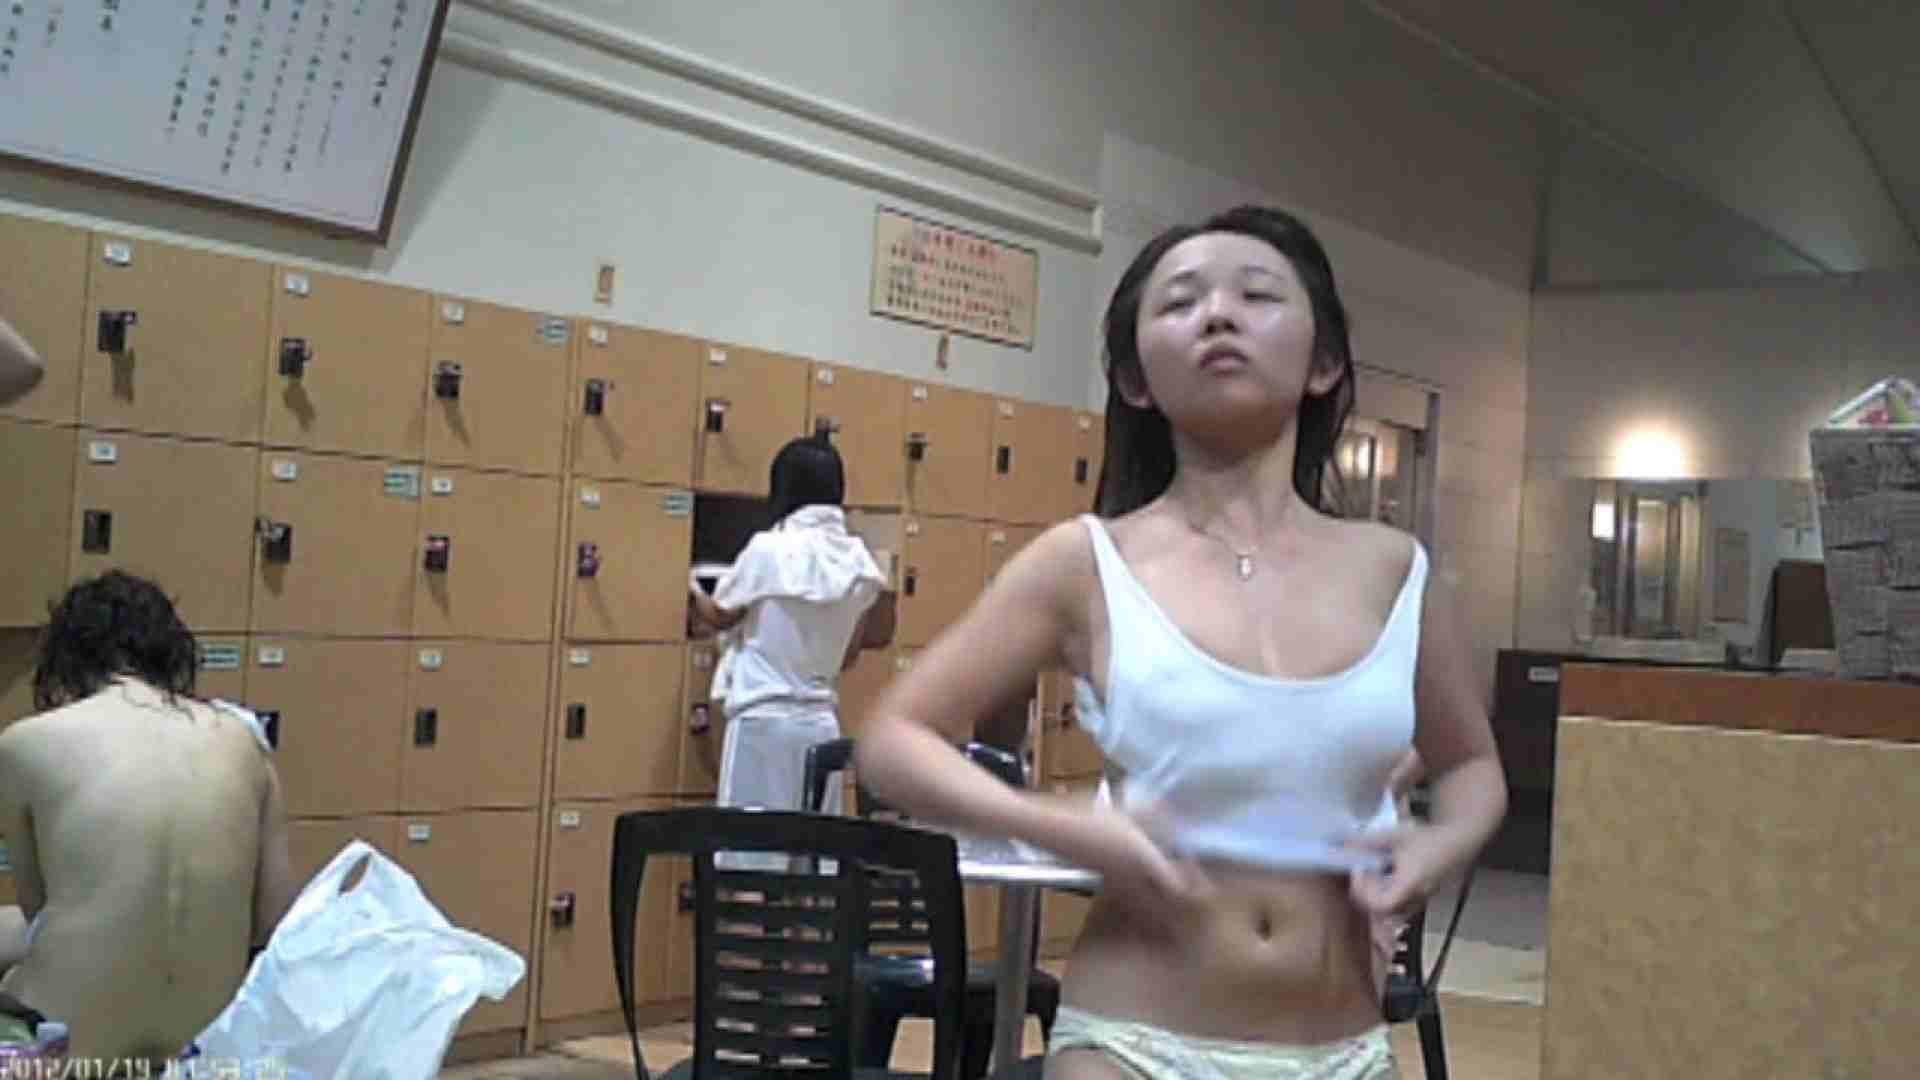 現役ギャル盗撮師 hana様の女風呂潜入撮!Vol.2 銭湯 | 盗撮  91pic 74